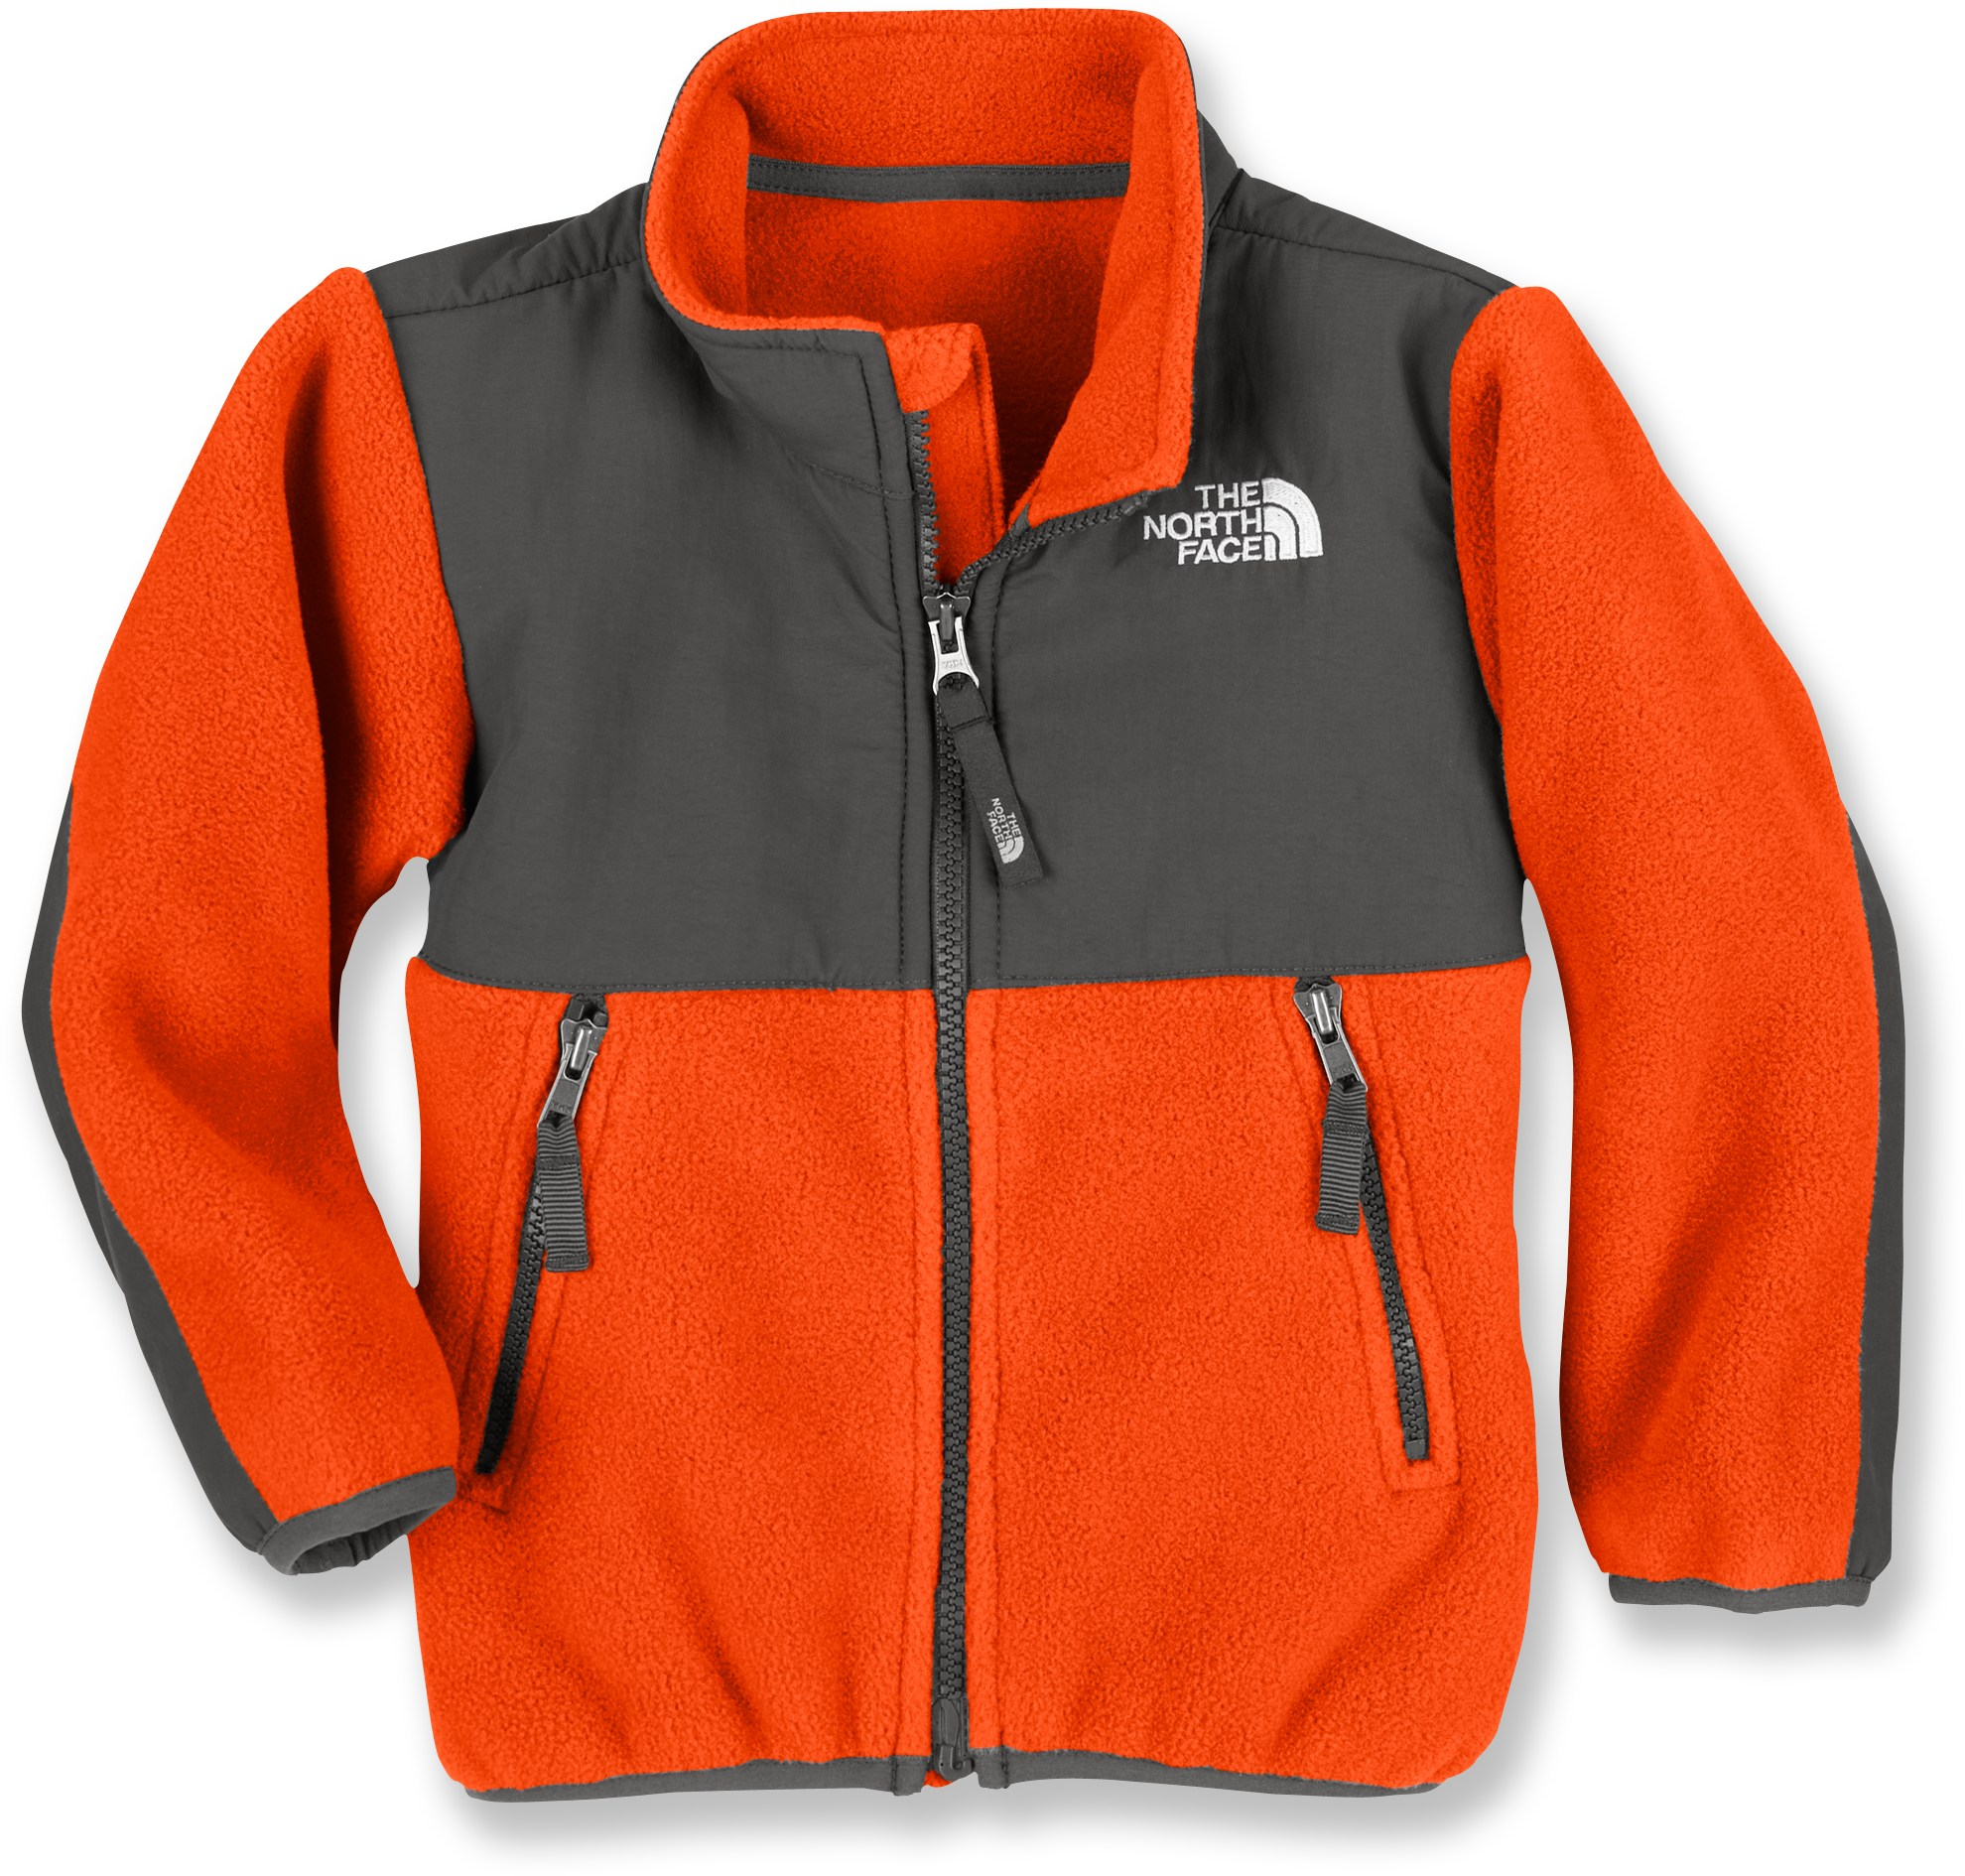 5bd061389 The North Face Denali Fleece - Boys- Size 3T in BELLALLEN's Garage Sale  Lacey, WA